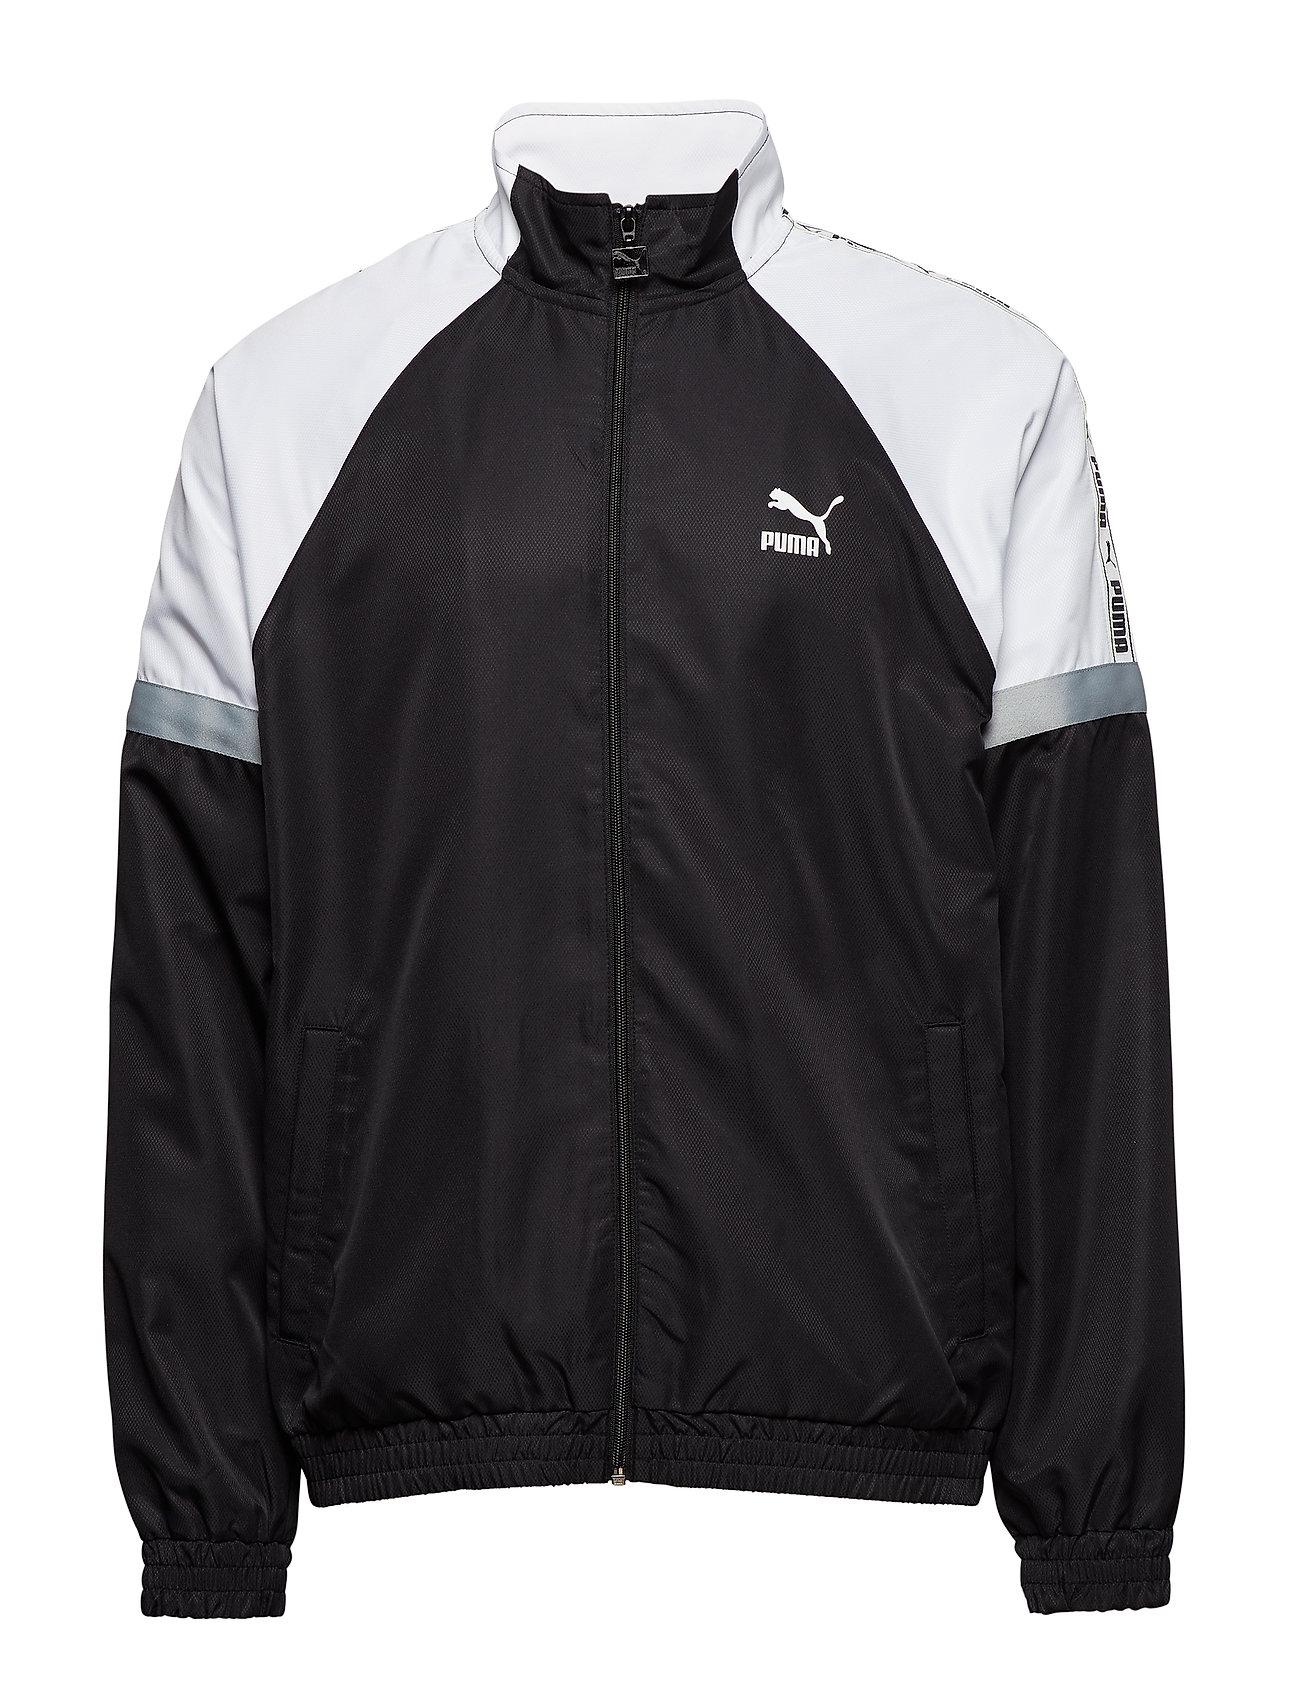 PUMA PUMA XTG Woven Jacket - PUMA BLACK-PUMA WHITE